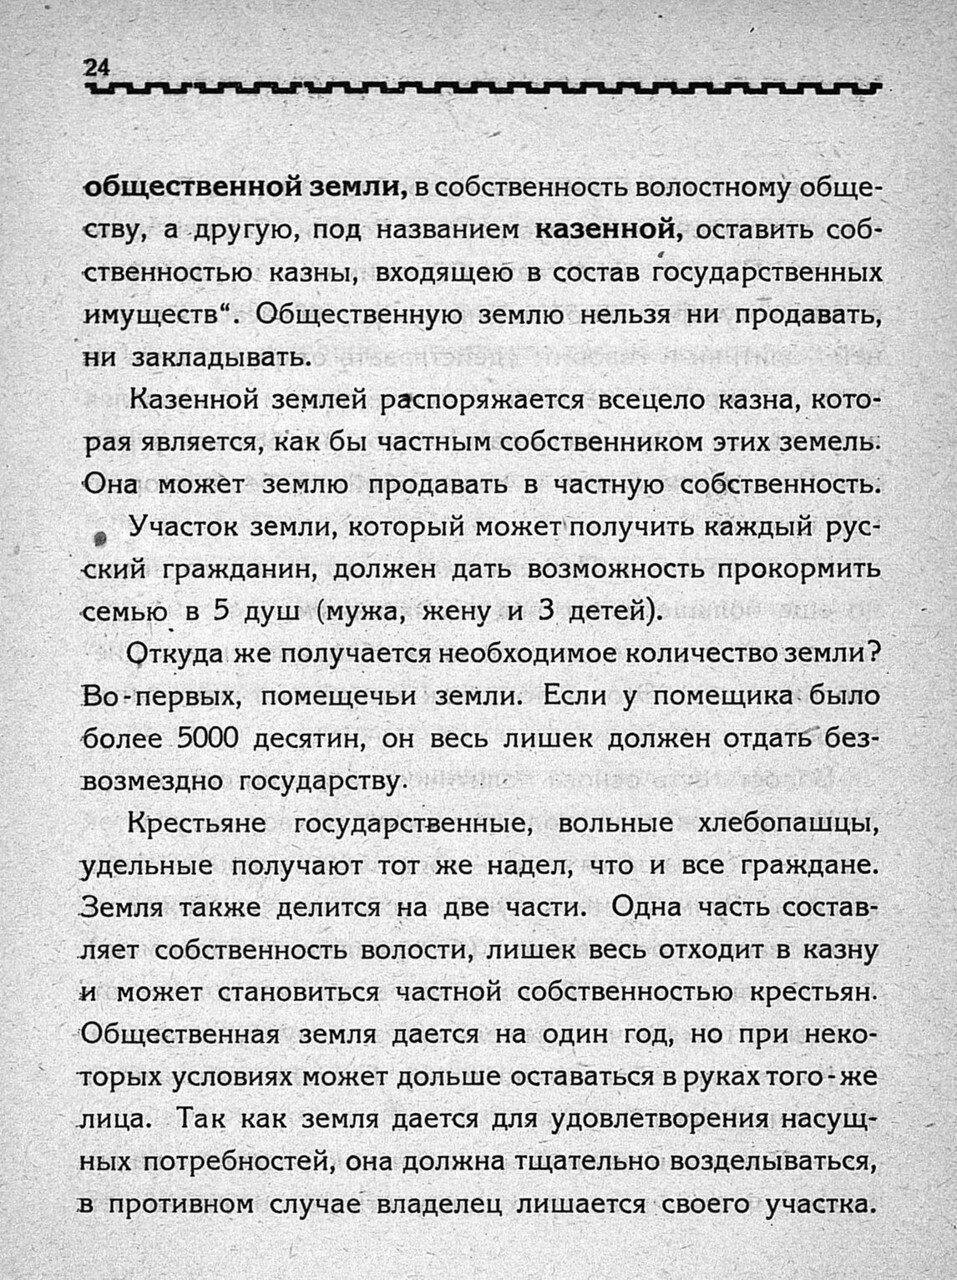 https://img-fotki.yandex.ru/get/128446/199368979.23/0_1bfadc_3c90a464_XXXL.jpg